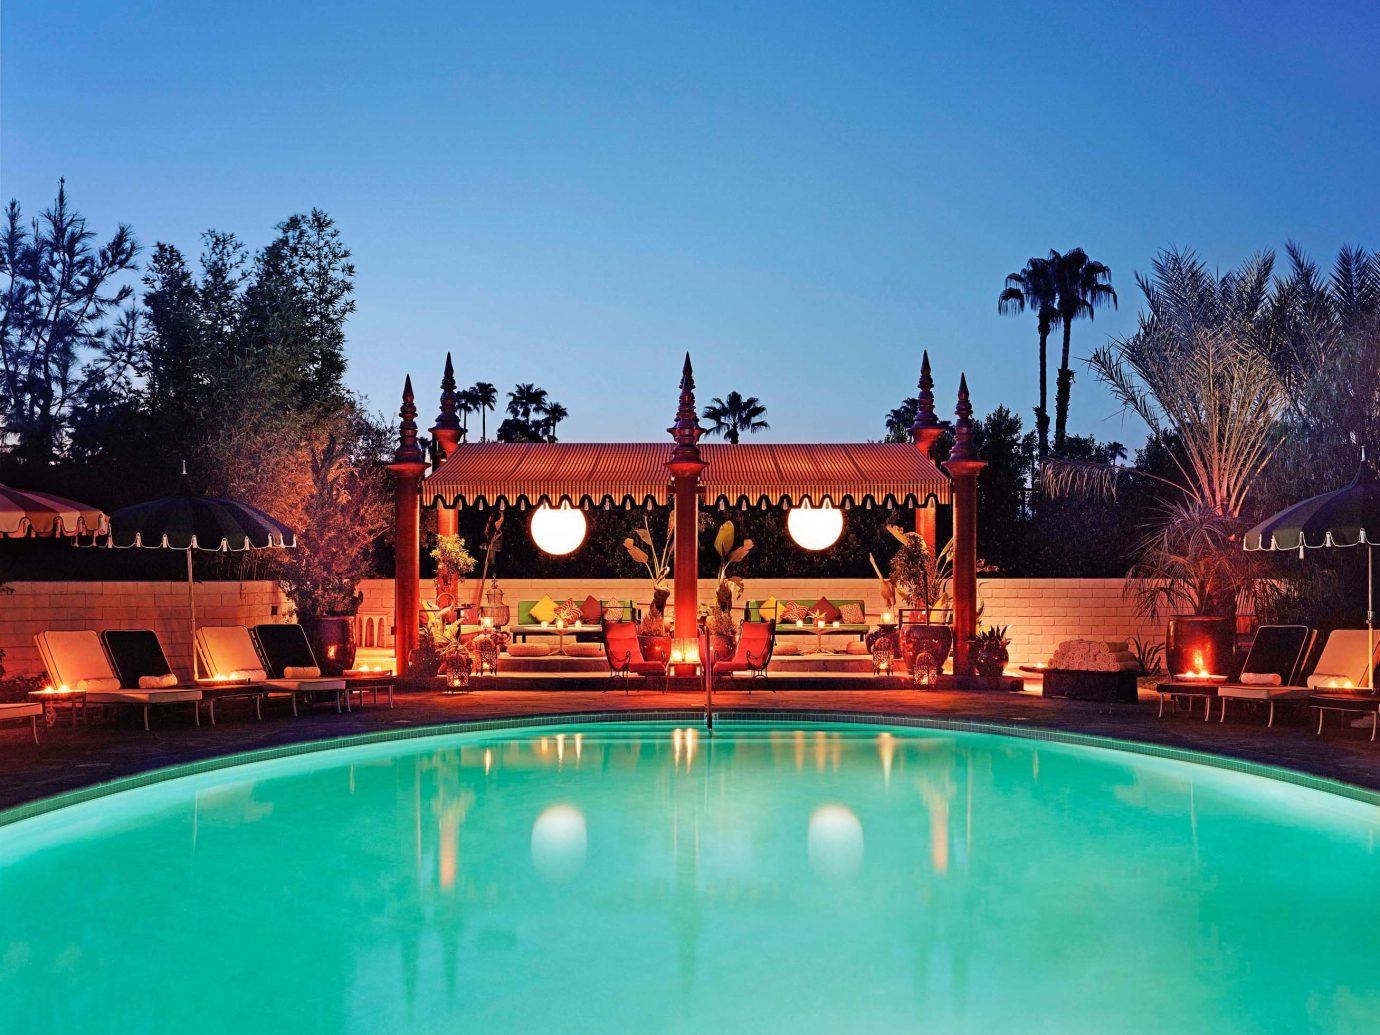 Hotels Pool Romance sky outdoor water swimming pool property building leisure estate Resort mansion Villa hacienda palace blue